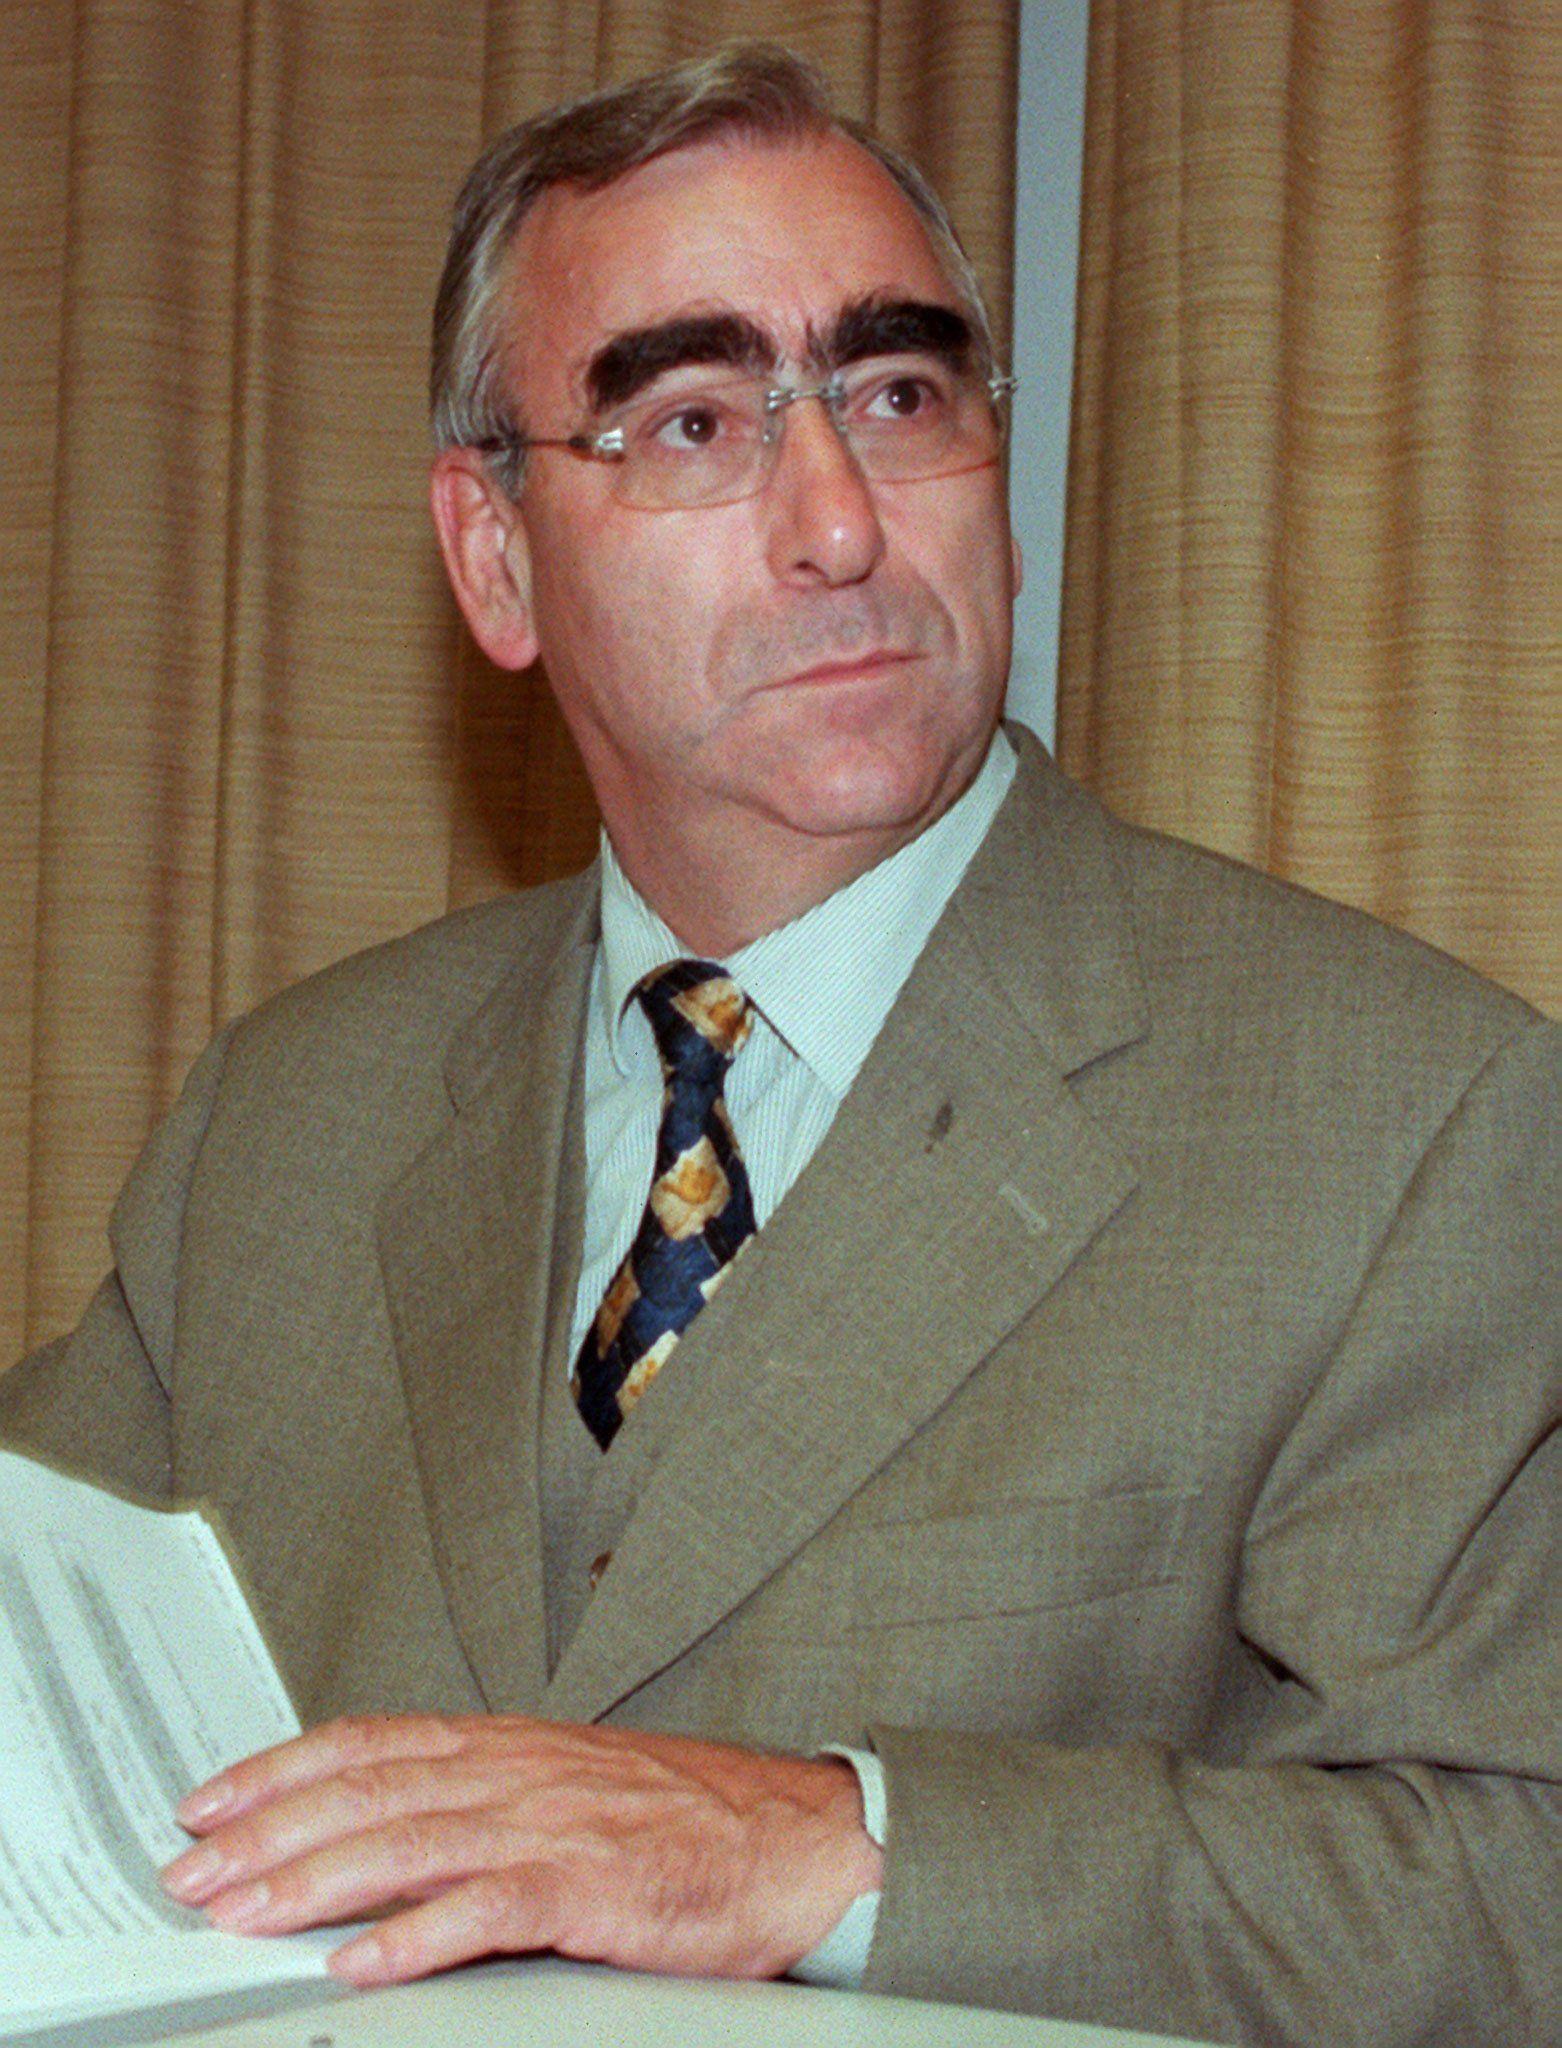 Finanzminister / Theo Waigel